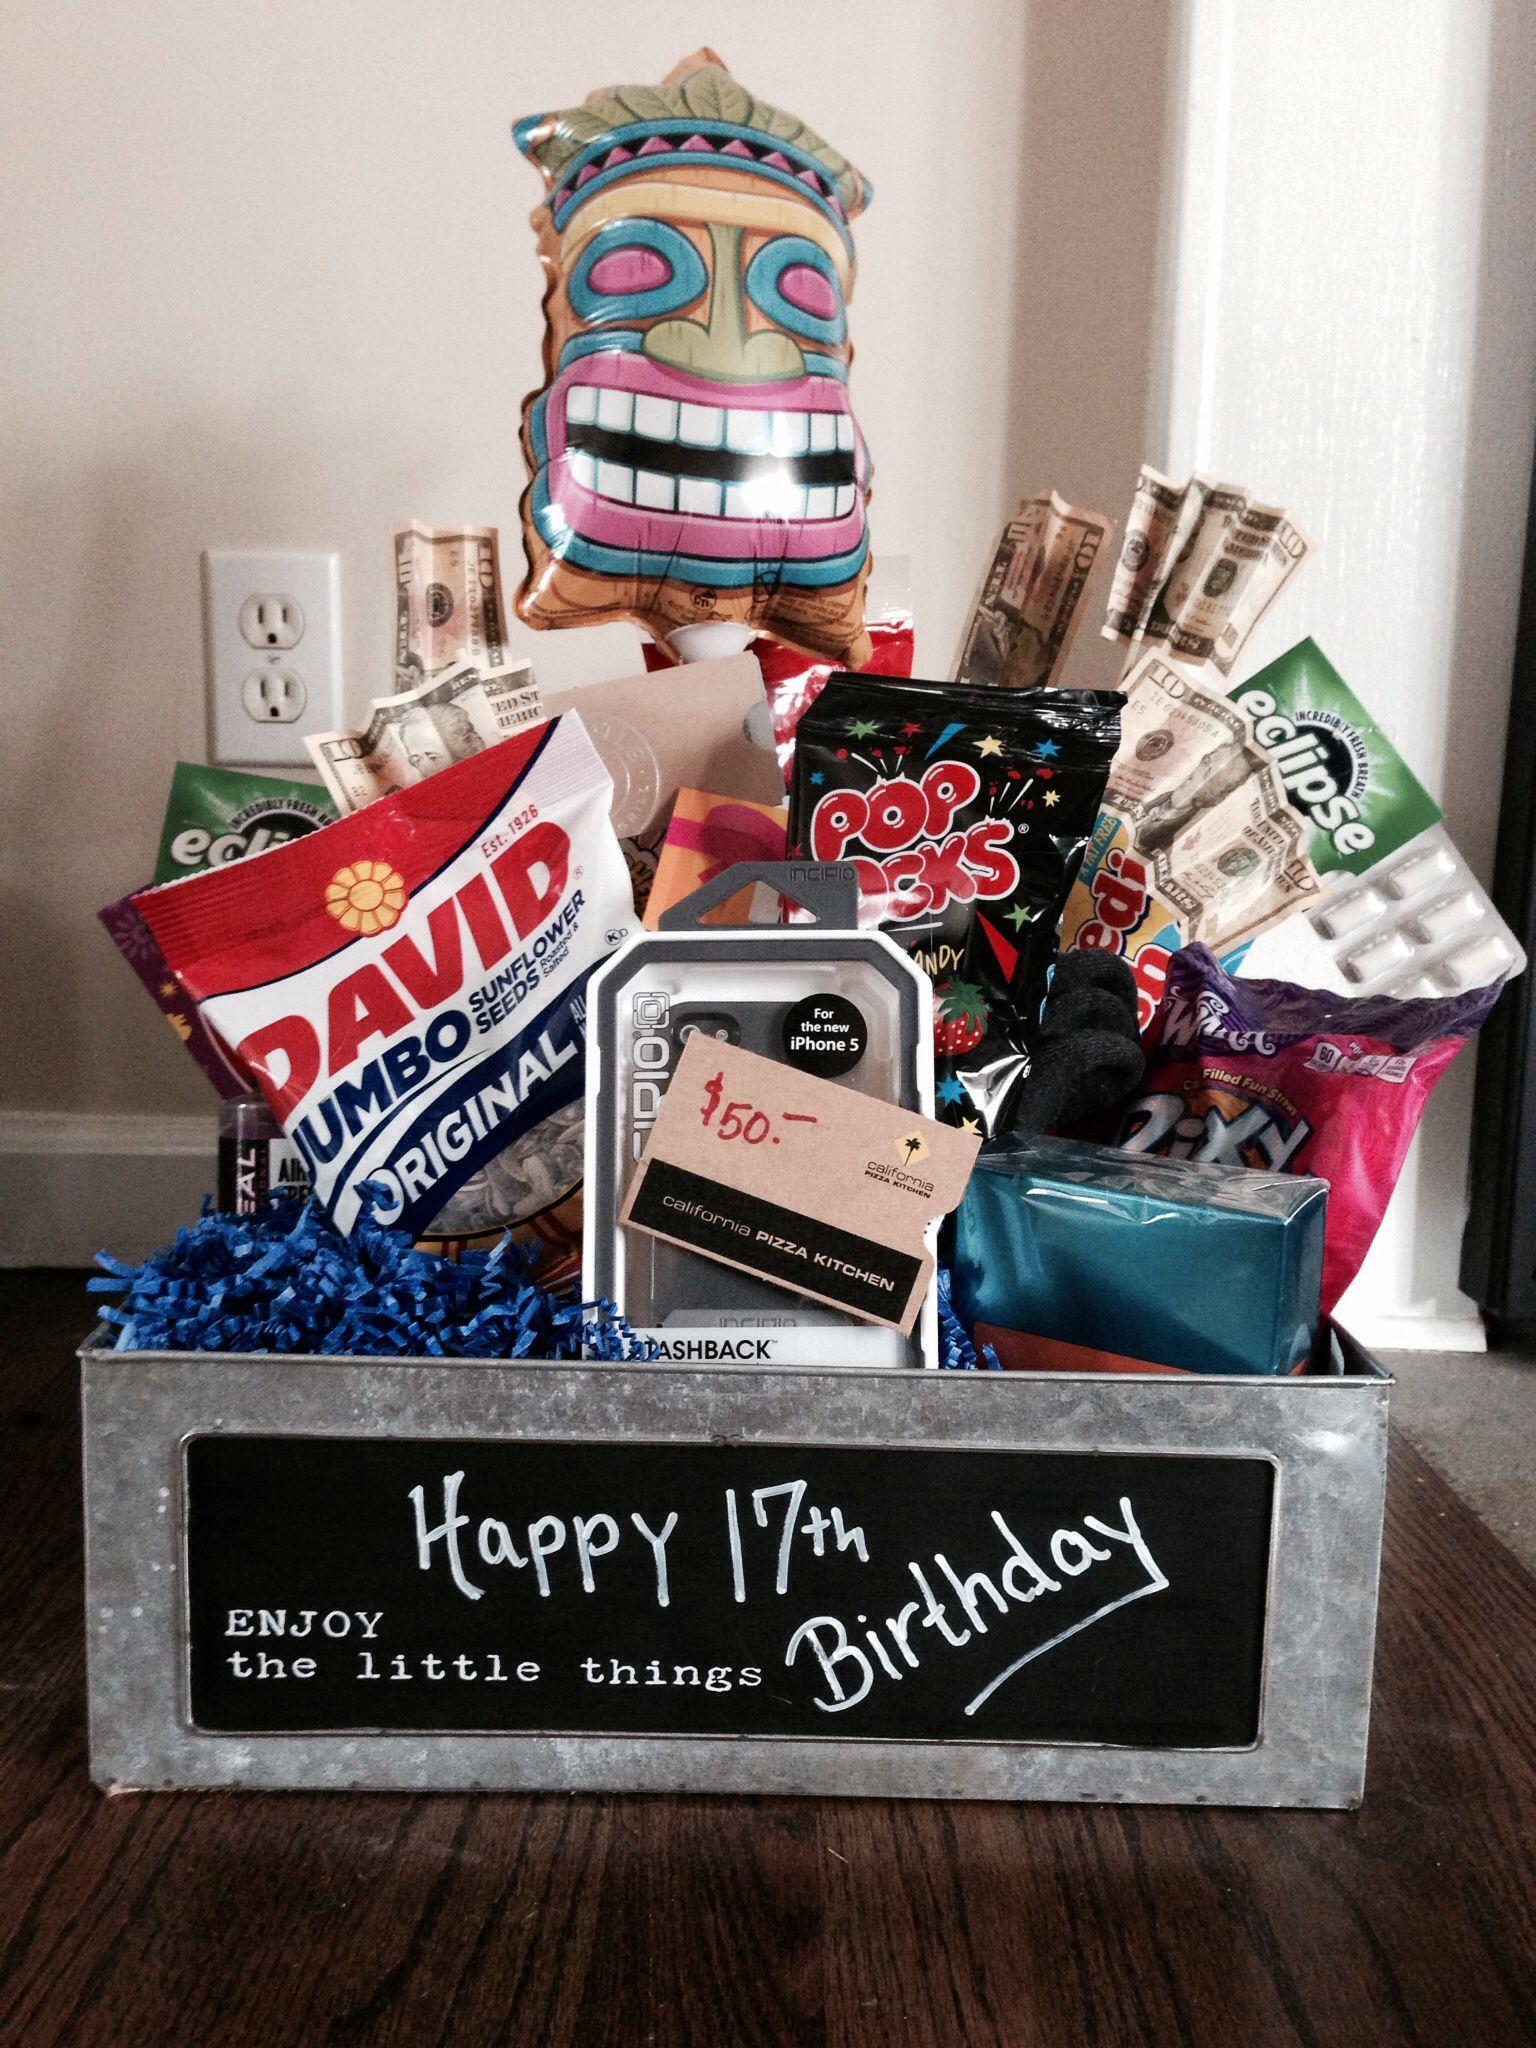 17th birthday gift lots